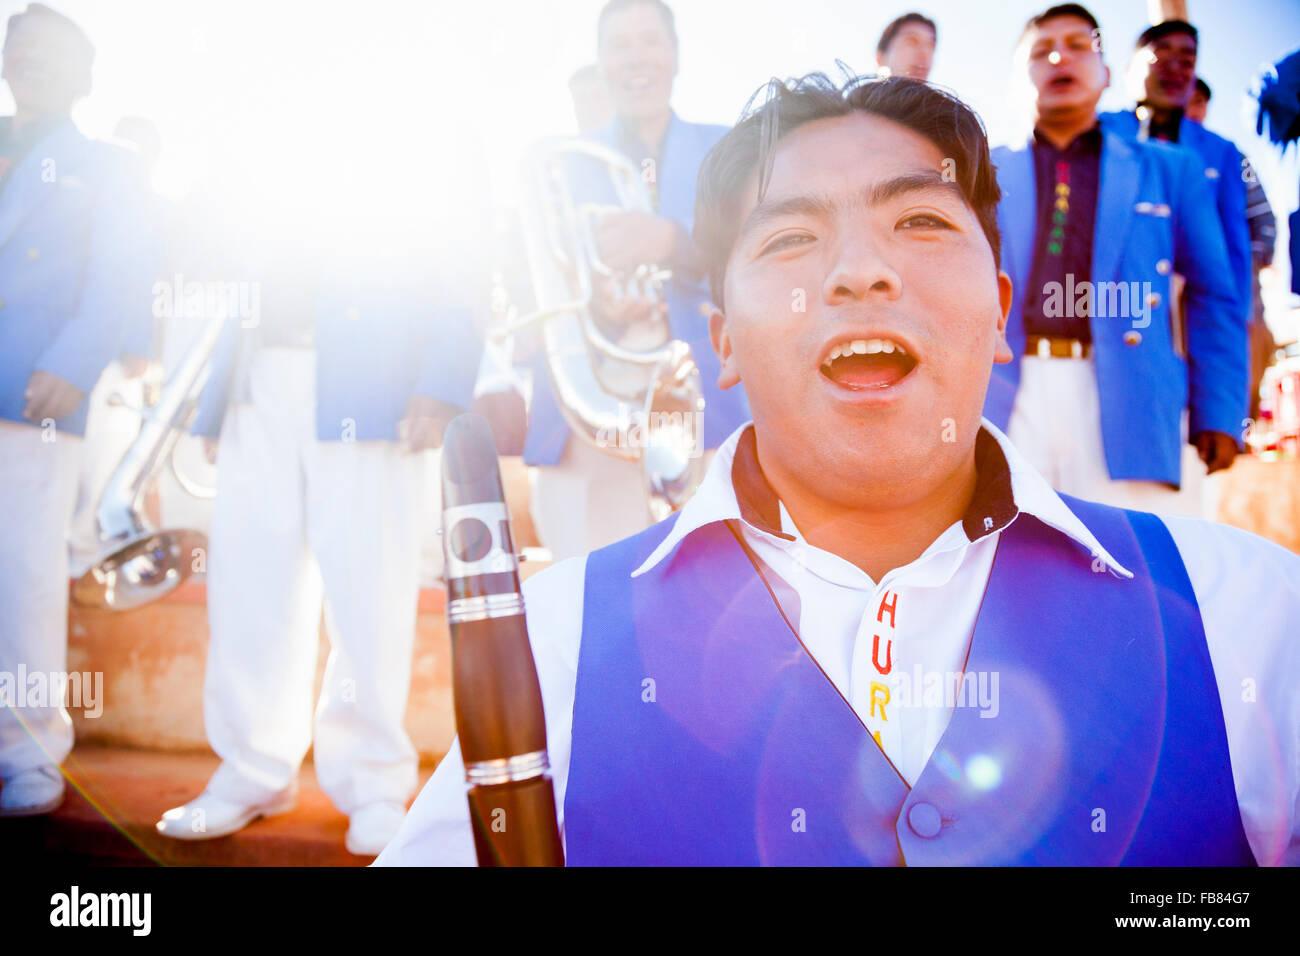 Band performing at the Fiesta de Nuestra Señora de Copacabana, Bolivia. - Stock Image